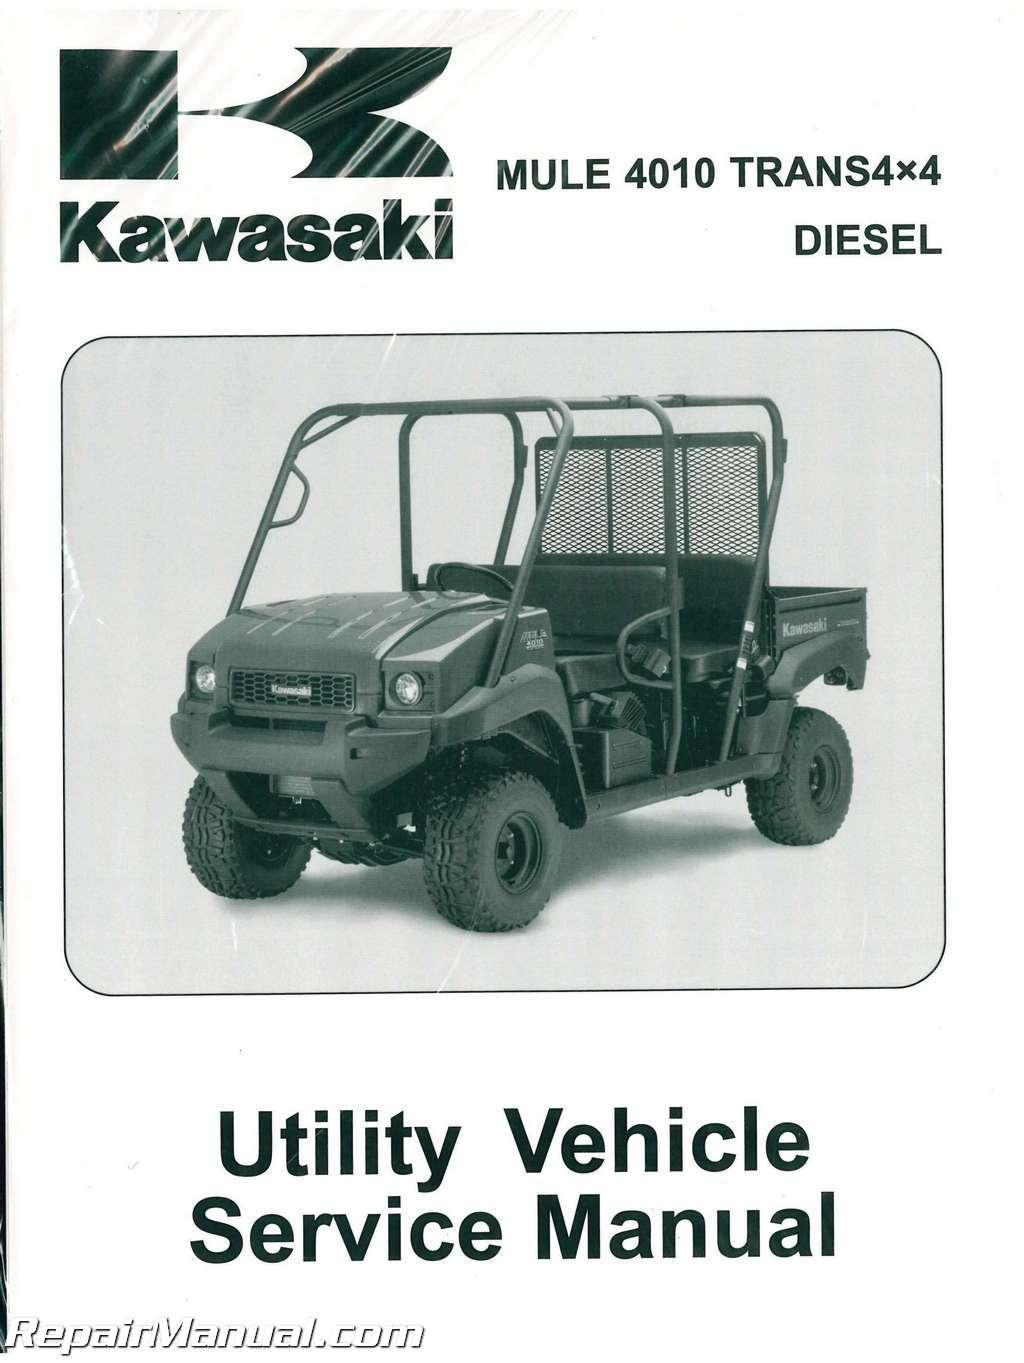 2009-2013 Kawasaki KAF950G H Mule 4010 Trans4x4 Diesel Side by Side Service  Manual